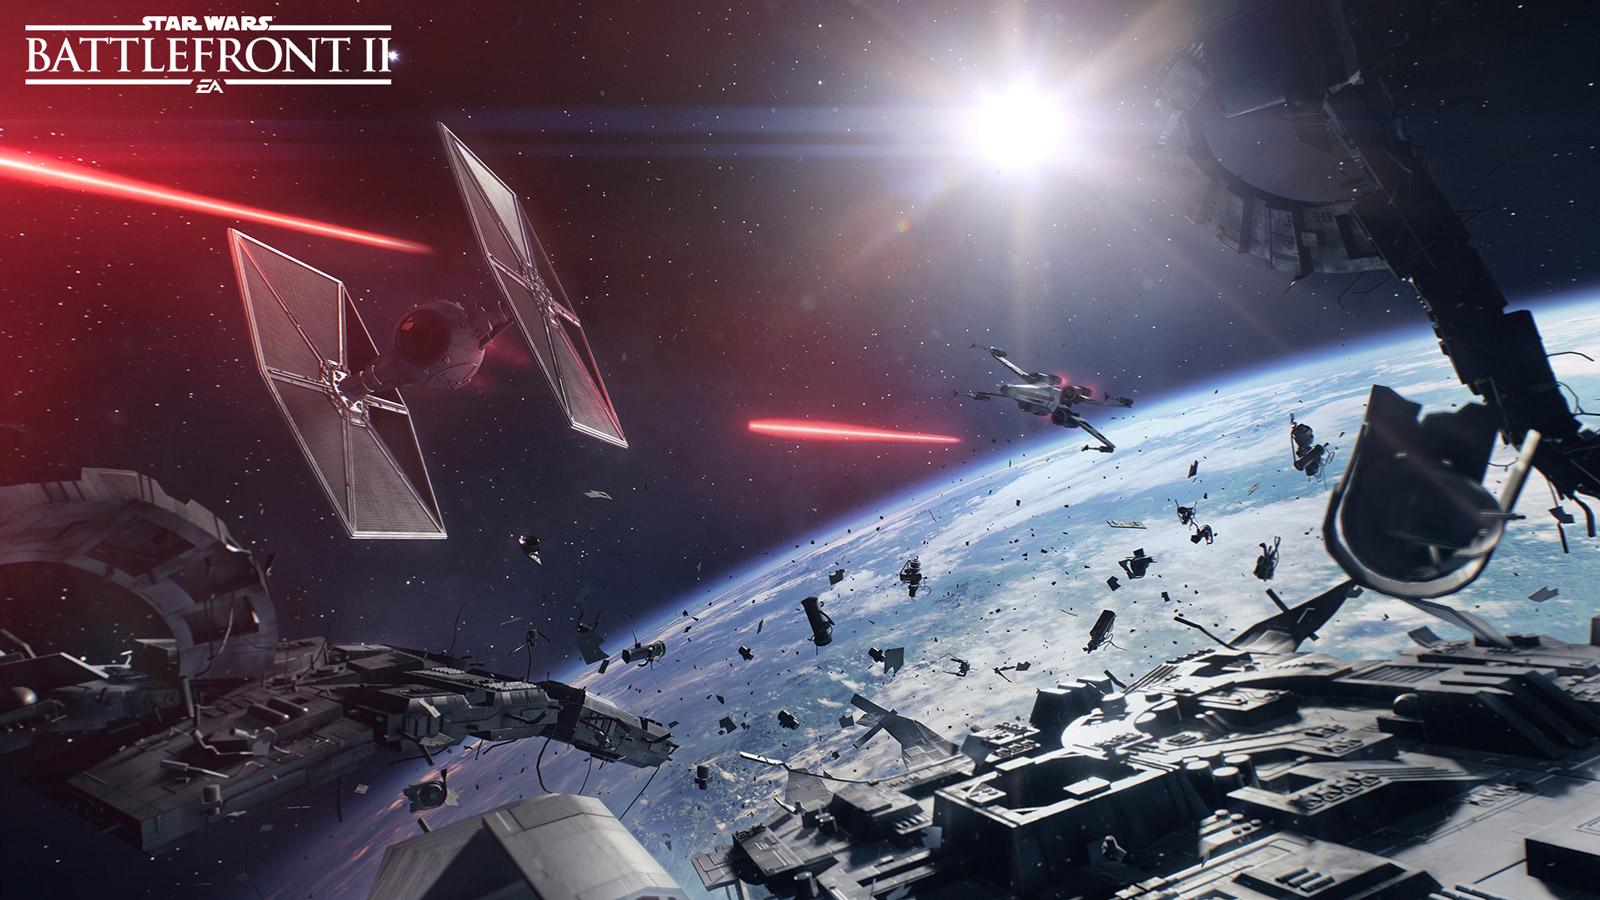 Star Wars: Battlefront II Wallpaper in 1600x900